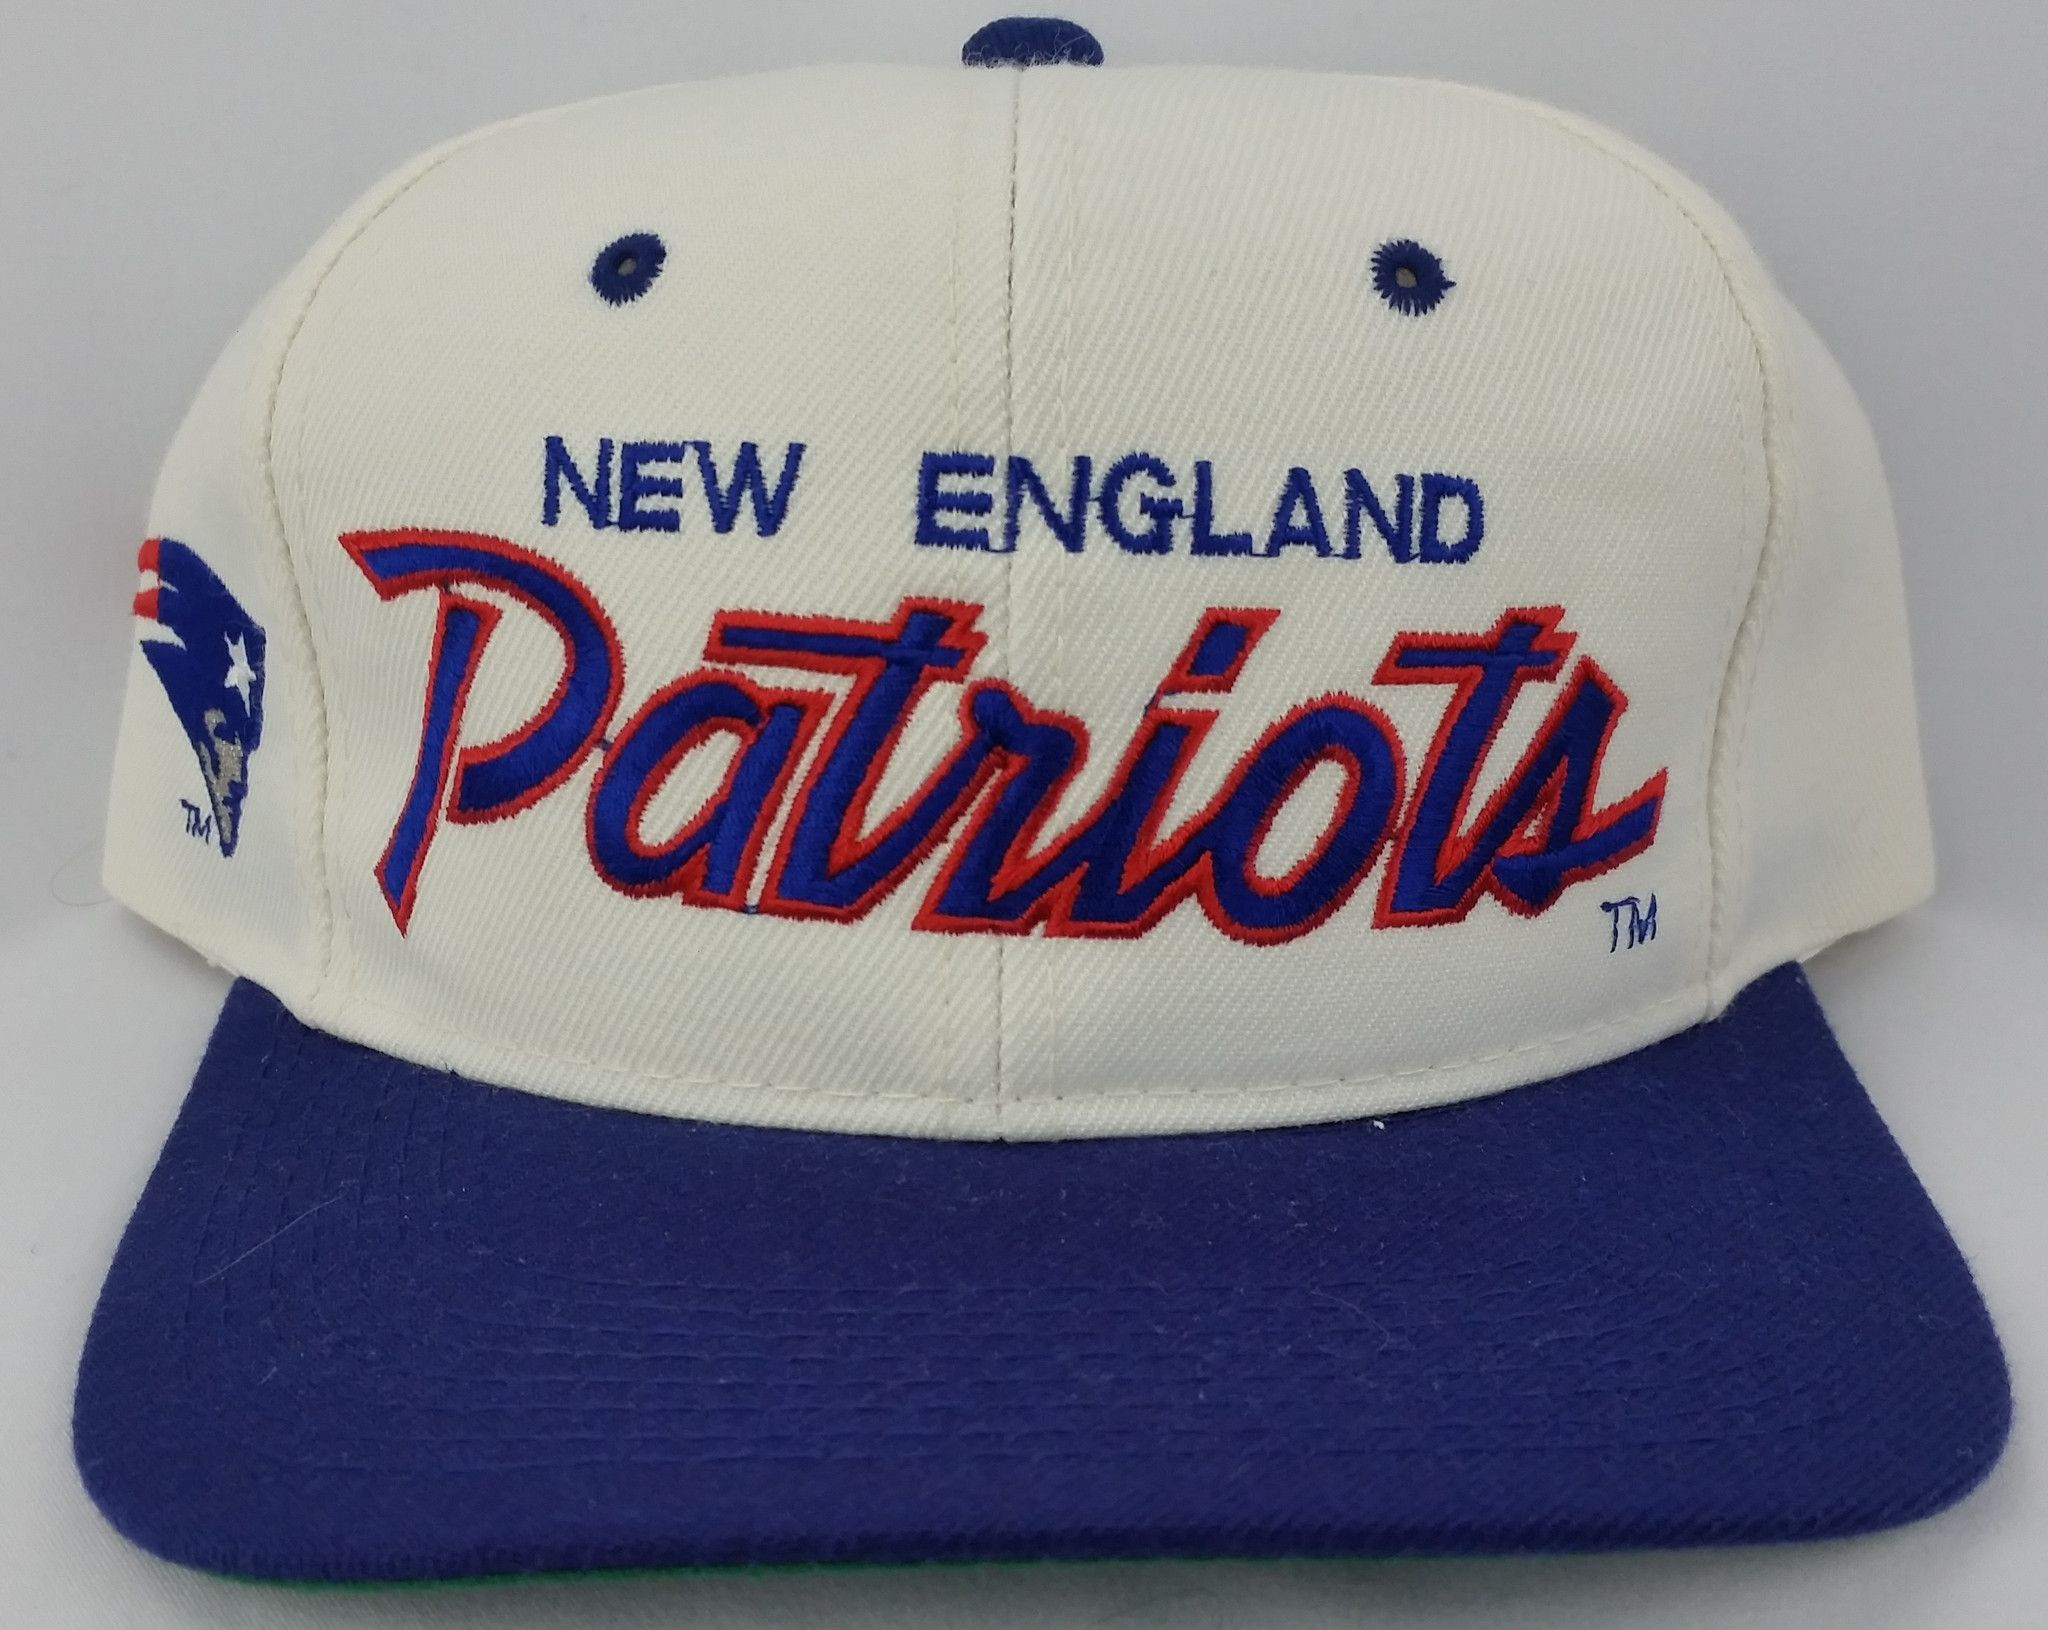 New England Patriots Vintage Snapback Sports Specialties Hat NFL Pro Line  Cap 6e965fc6cec8